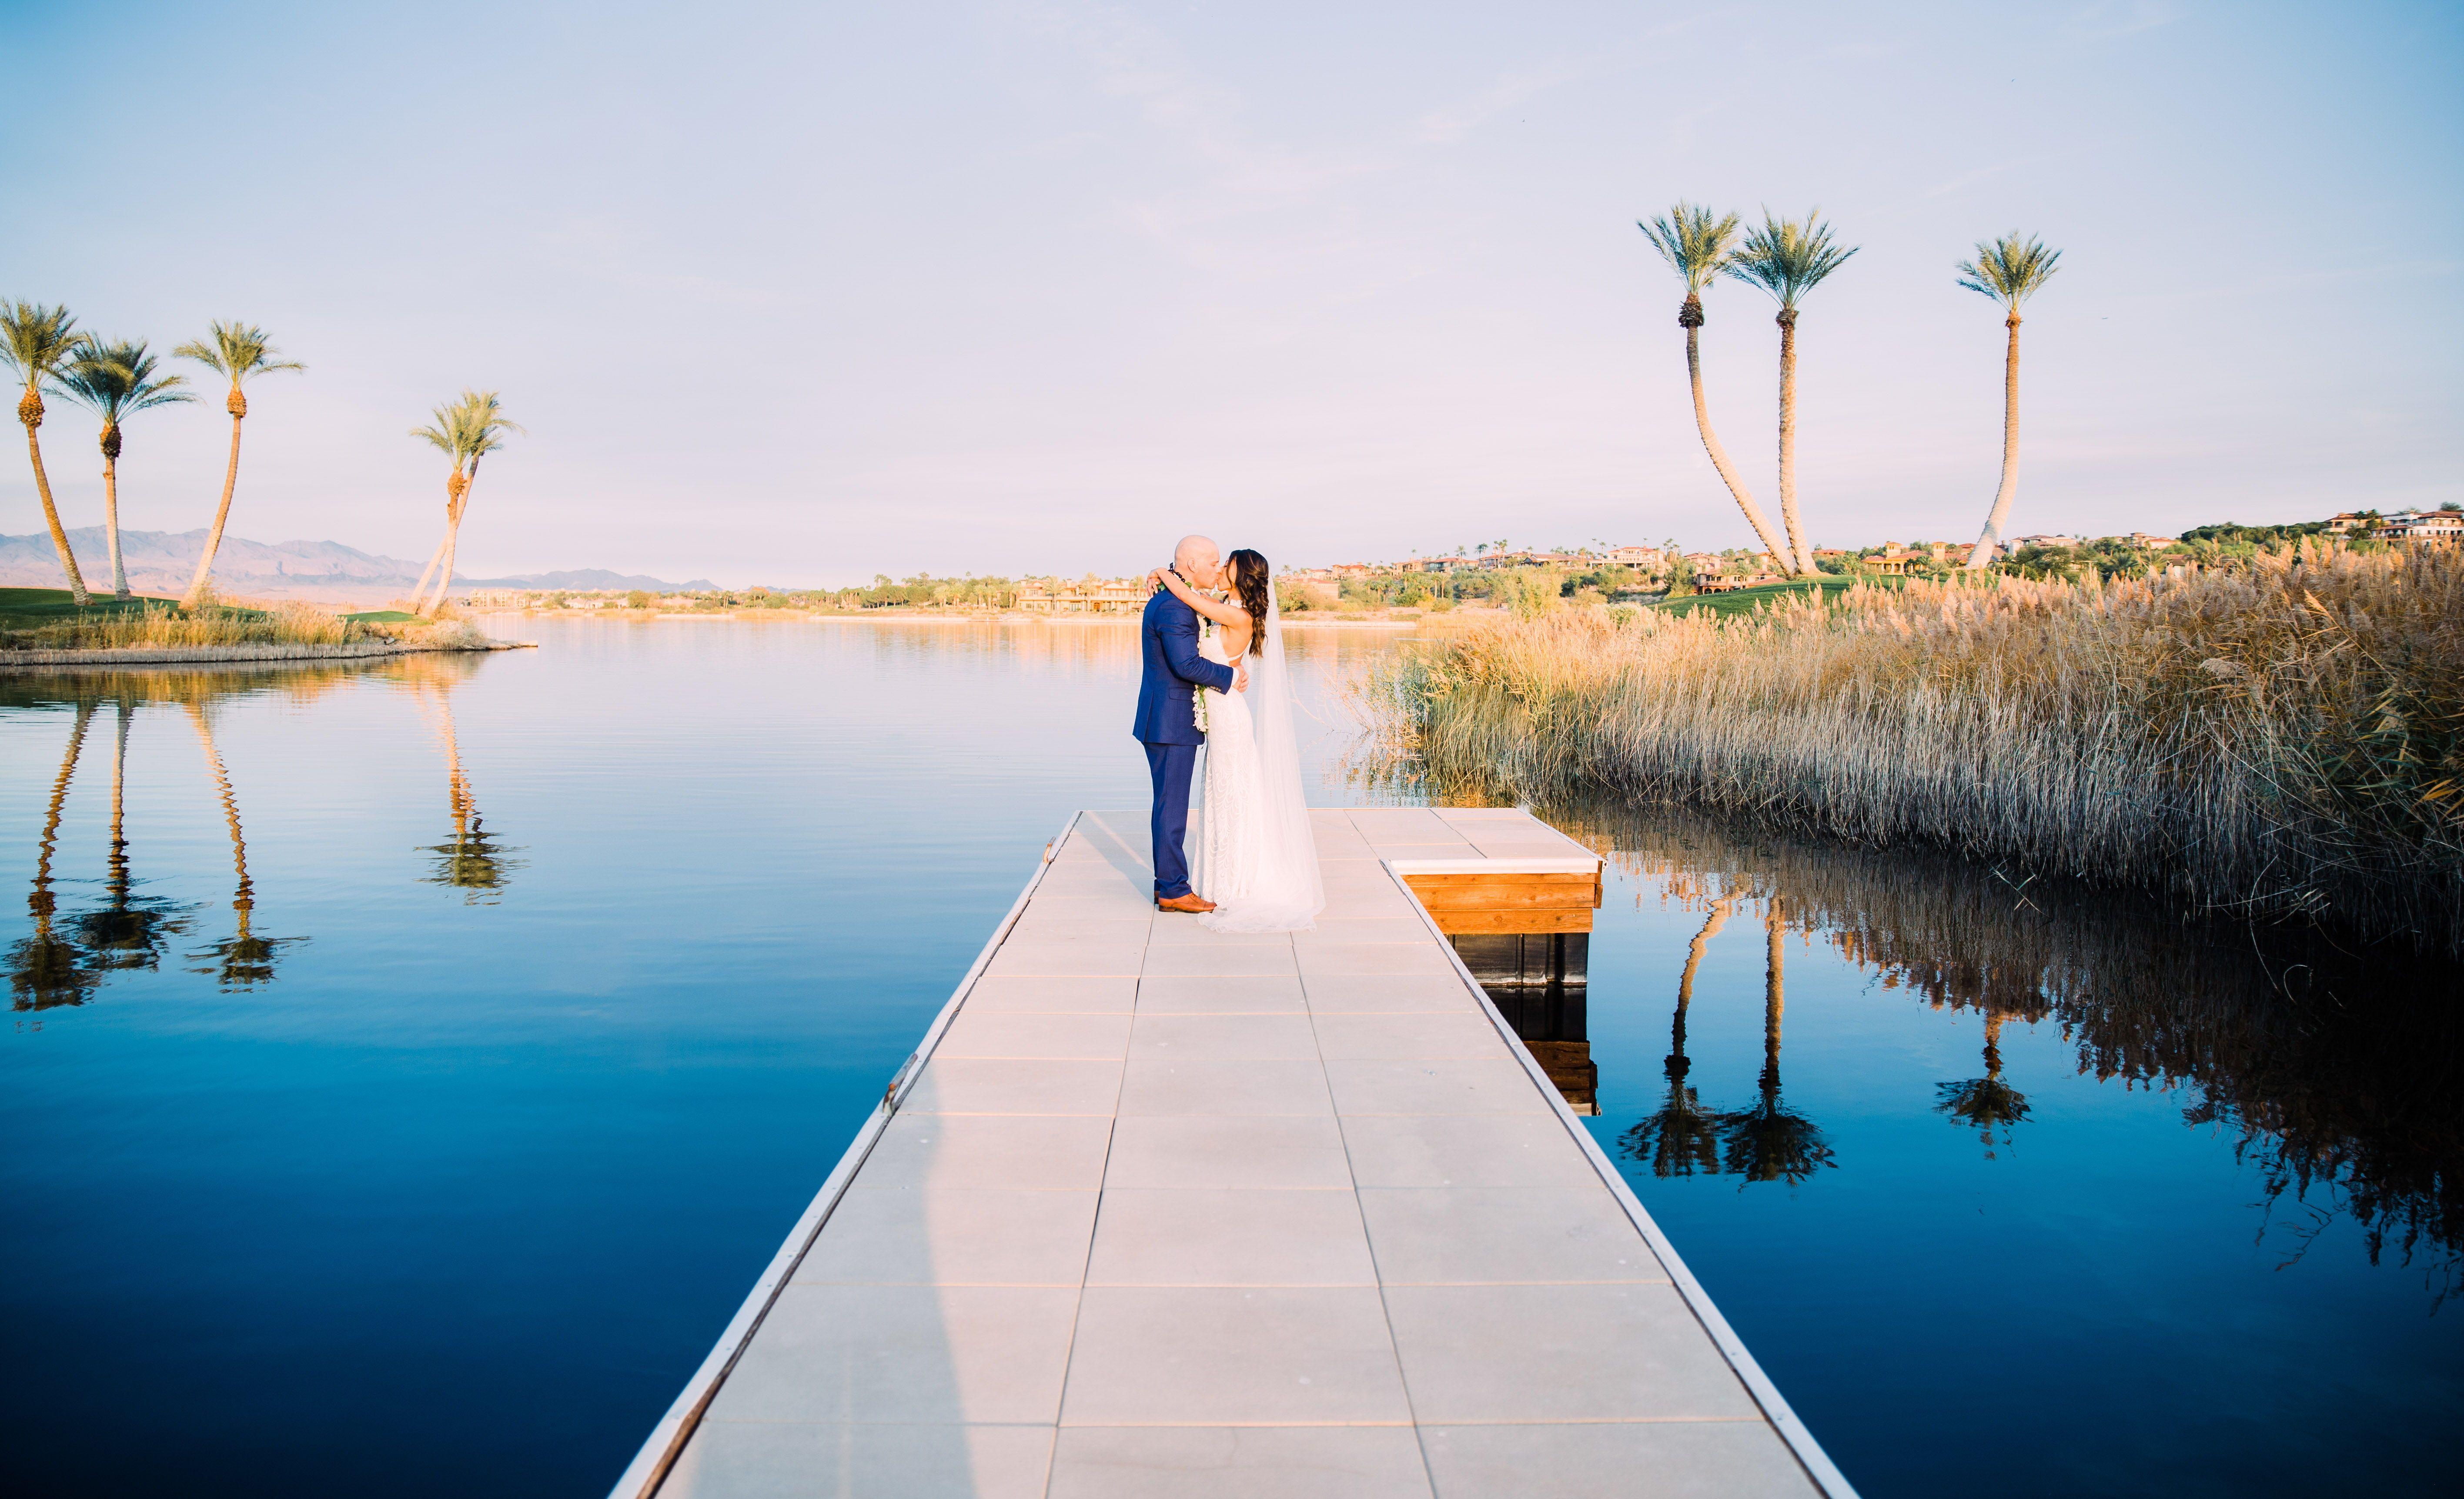 Lakeside las vegas wedding with images las vegas